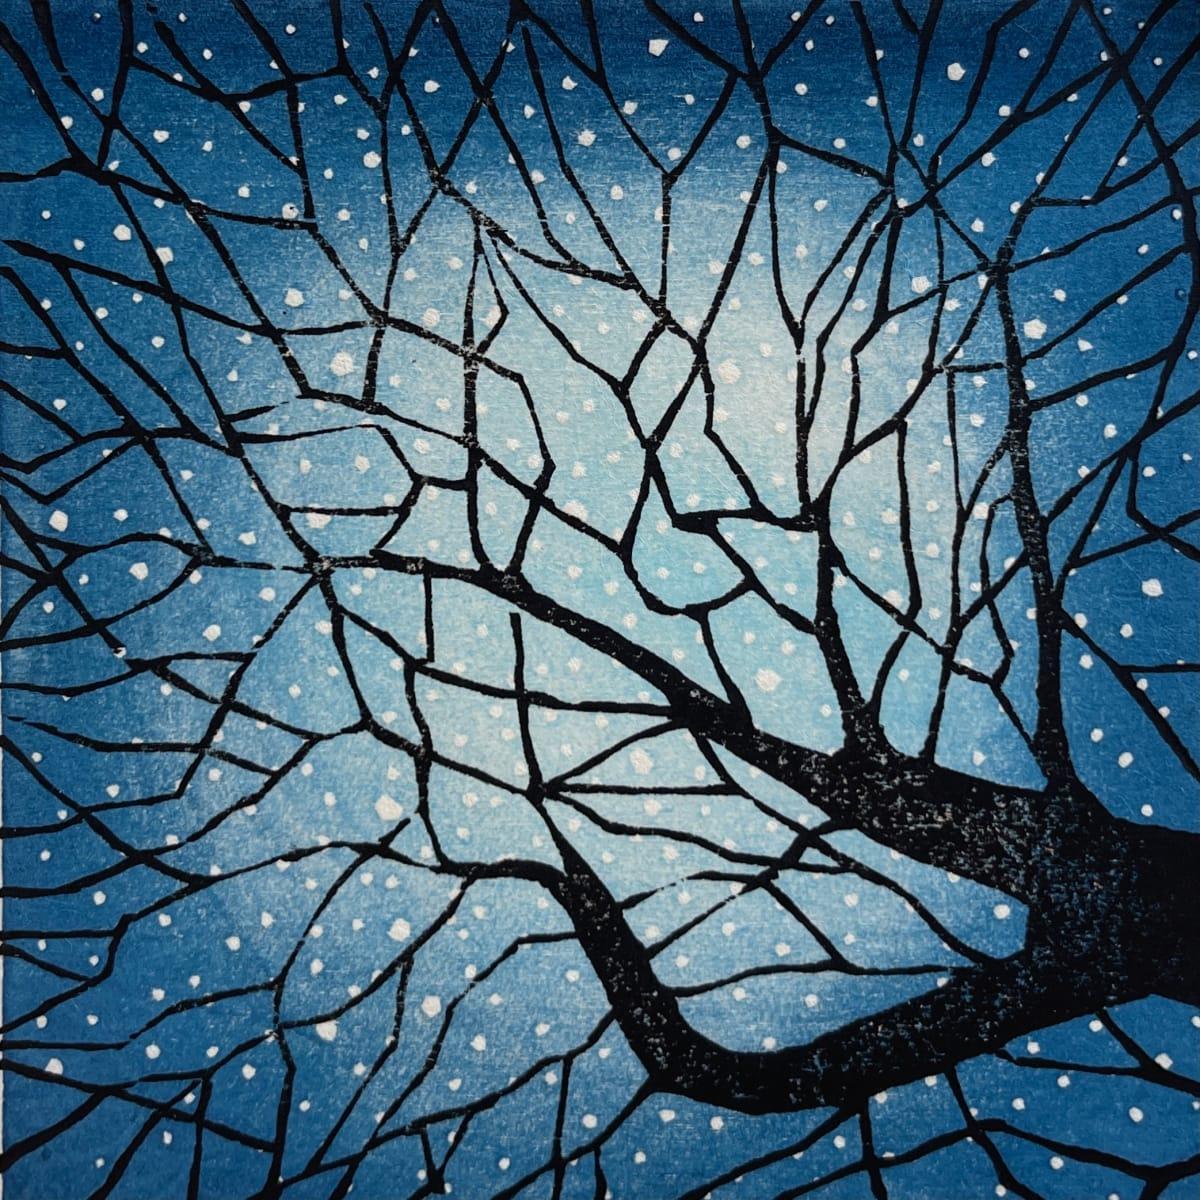 Constellation #3 by Mara Cozzolino